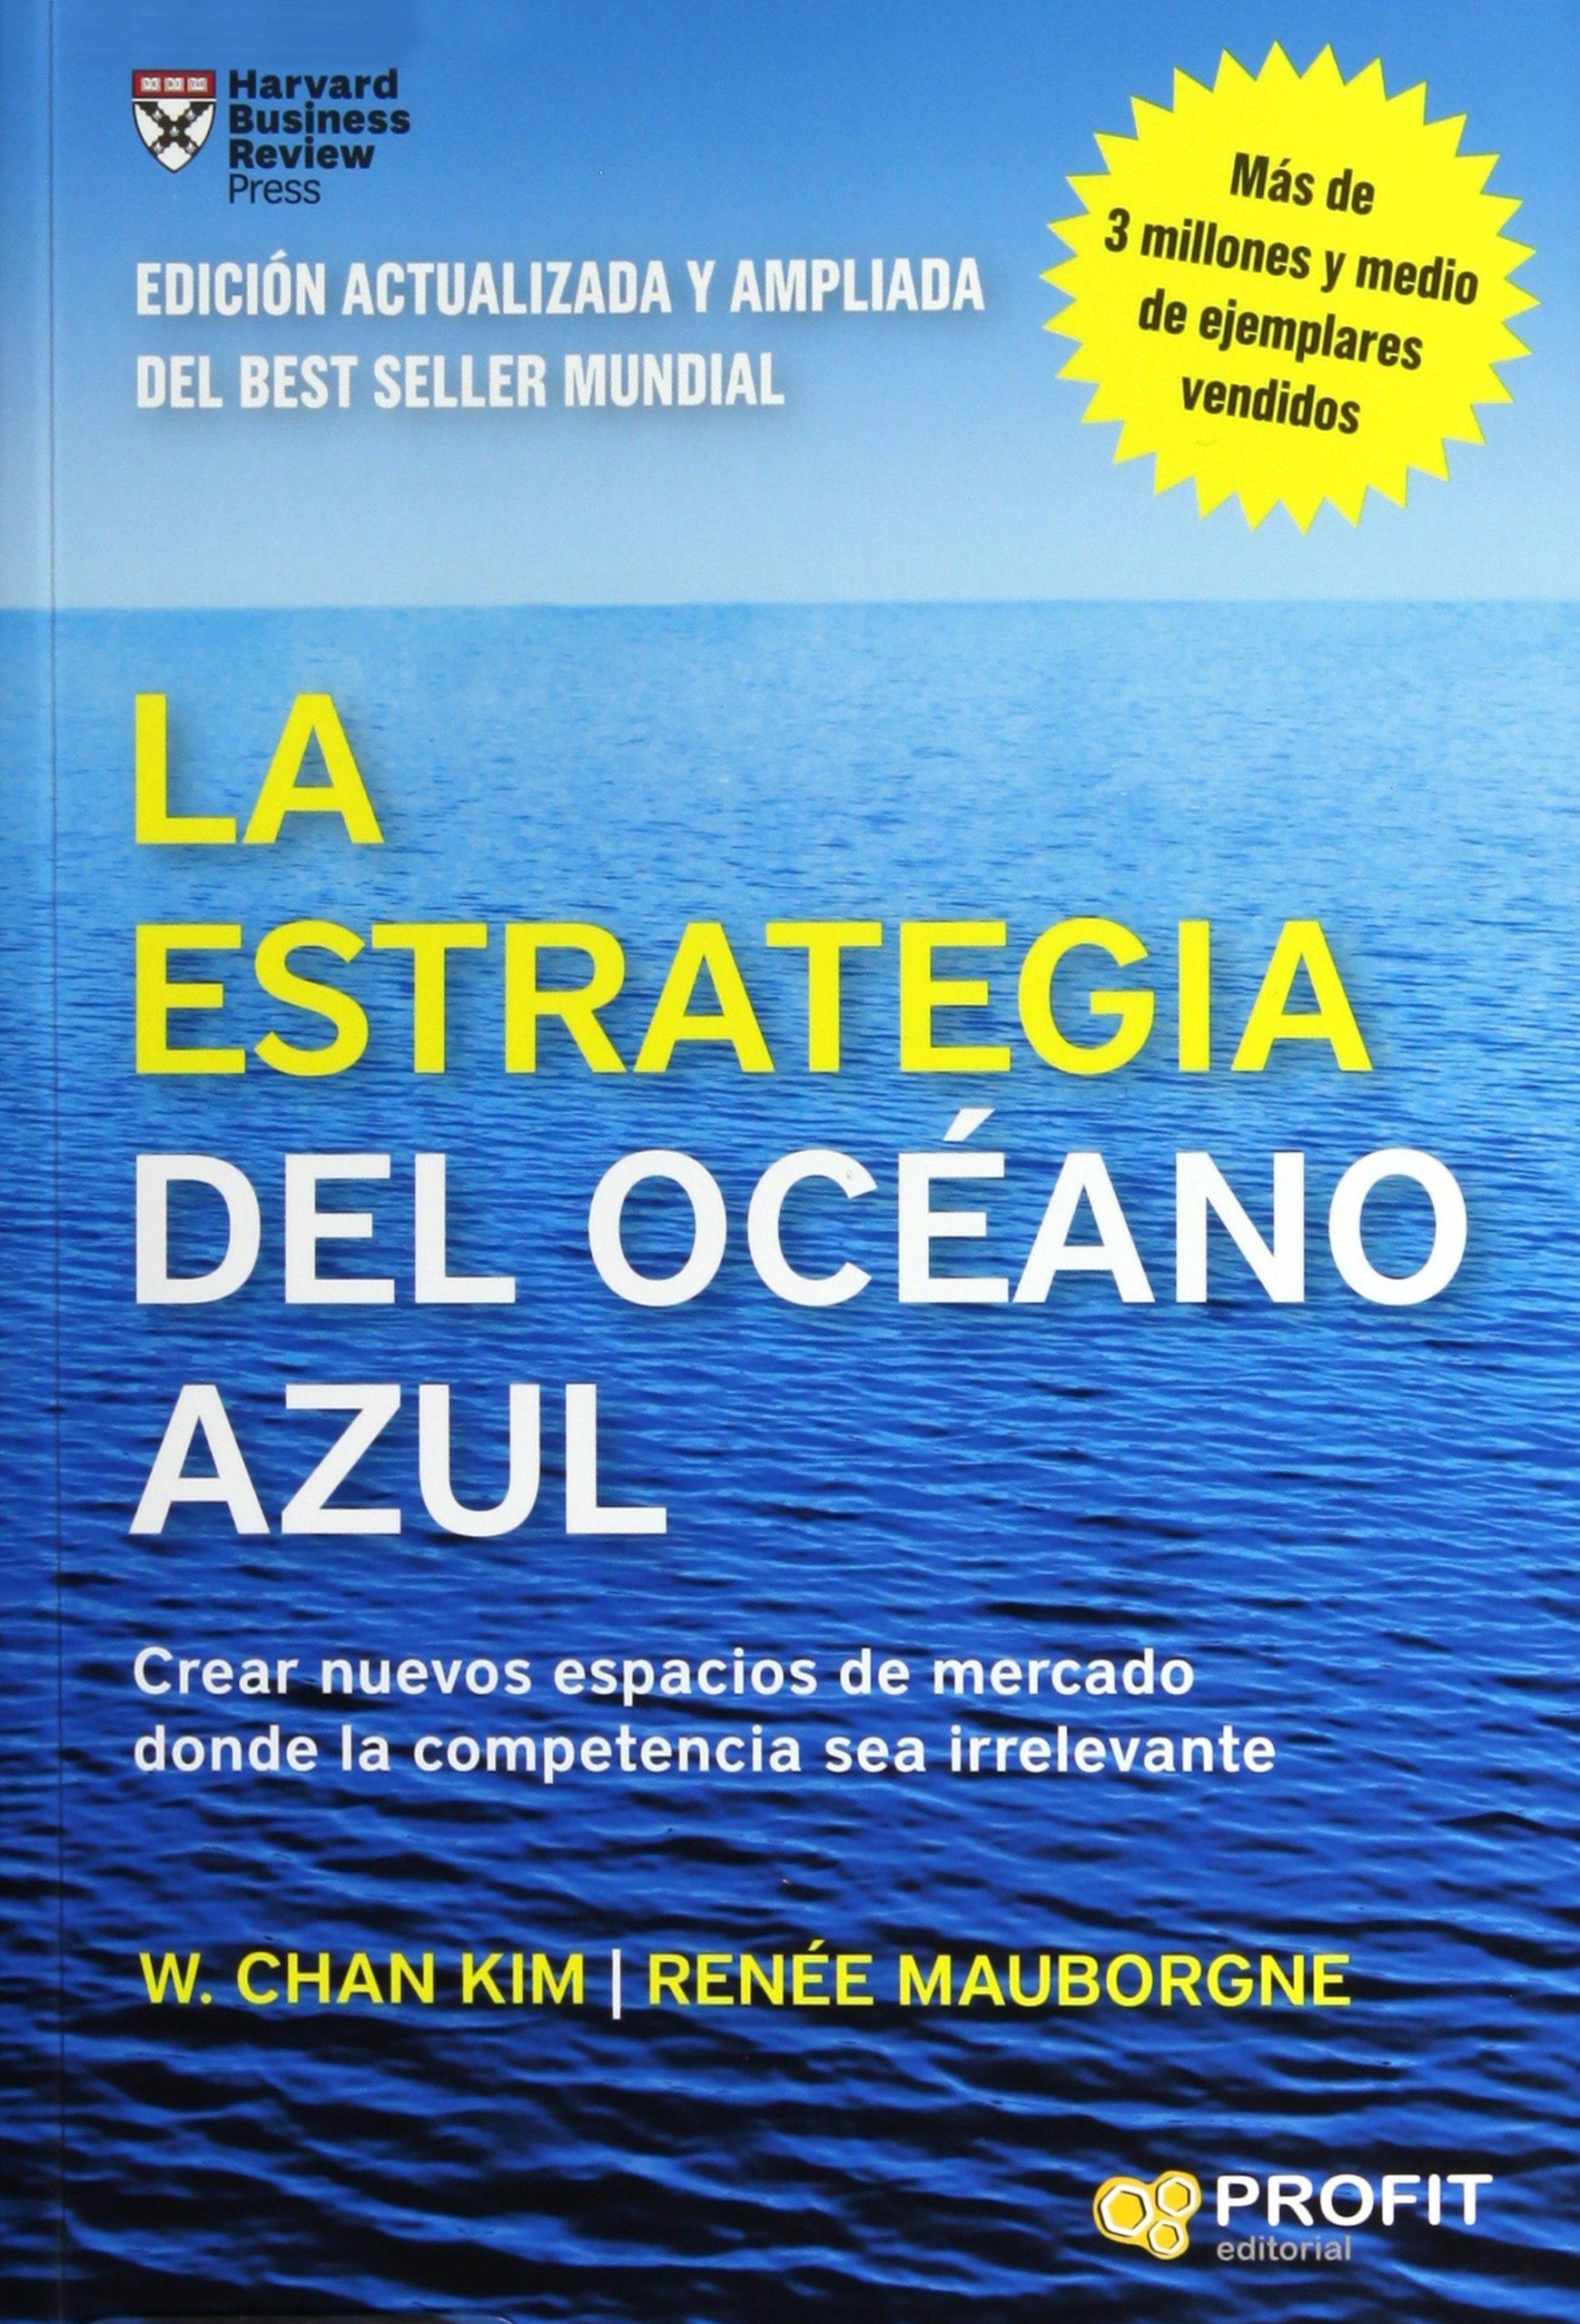 La estrategia del océano azul  Amazon.es  W. Chan Kim, Renée Mauborgne,  Emili Atmetlla Benavent  Libros 11194c63bb